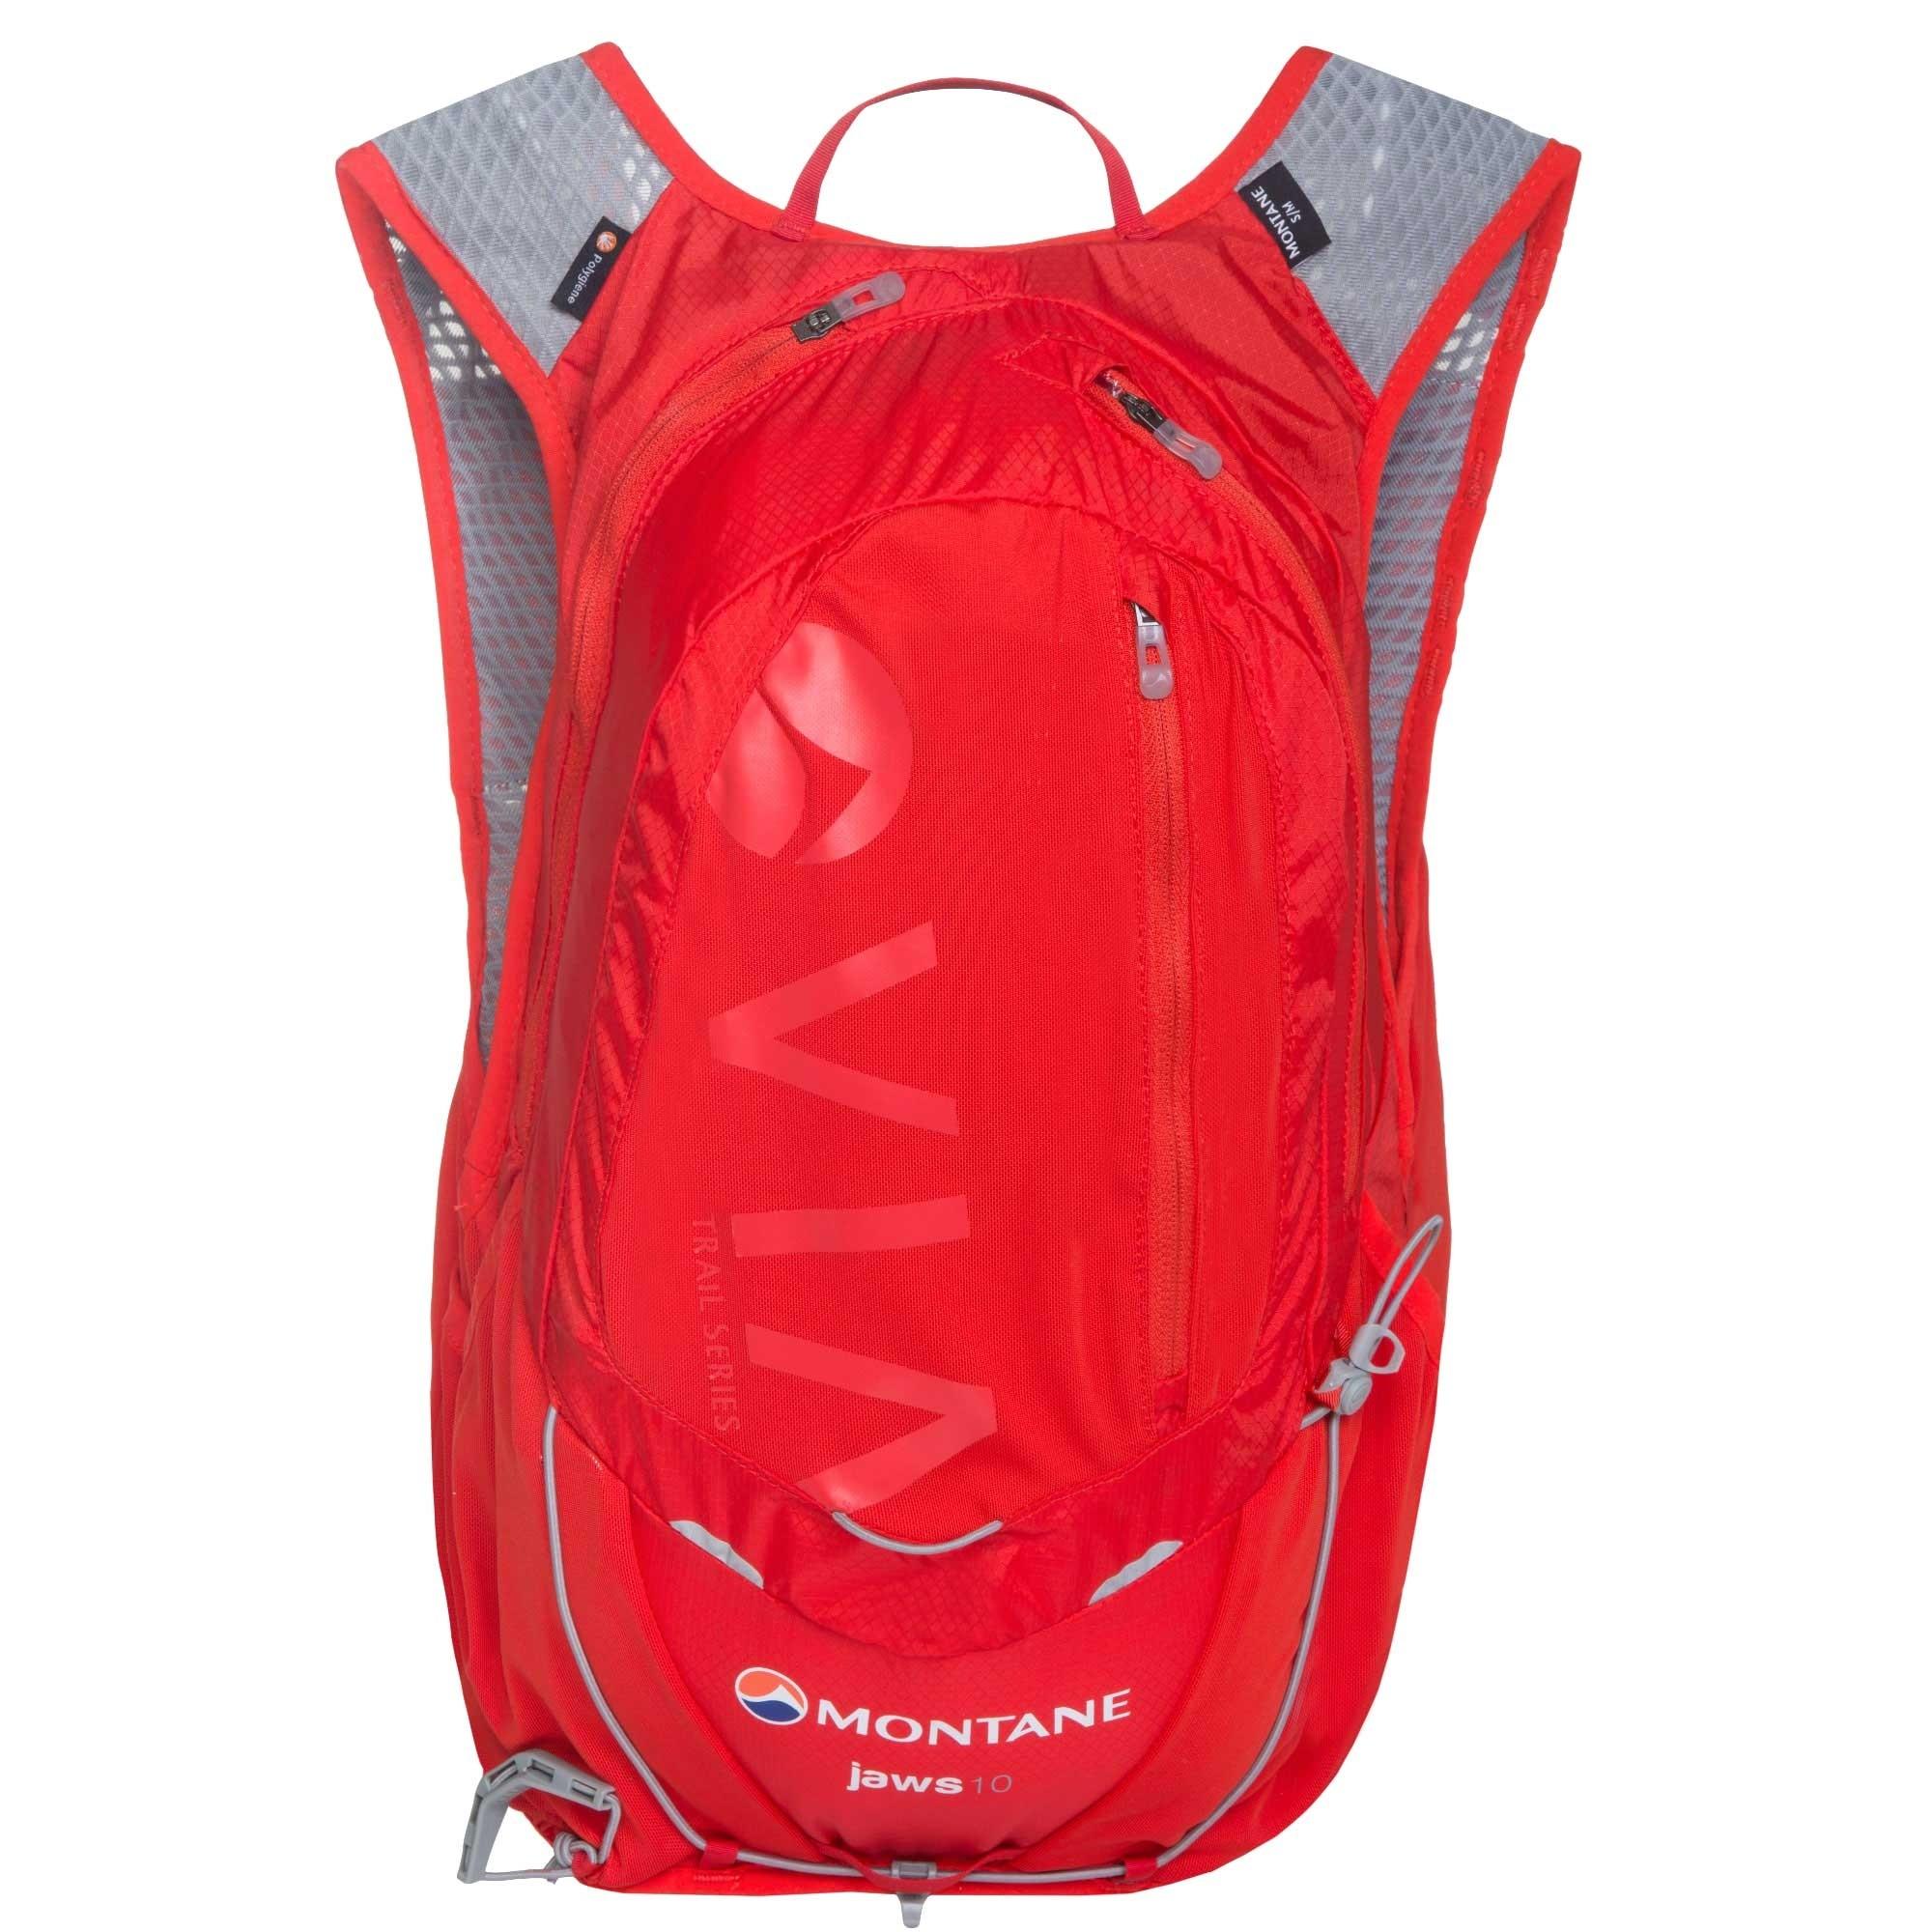 Montane VIA Jaws 10 Trail Running Speedpack - Back - Flag Red